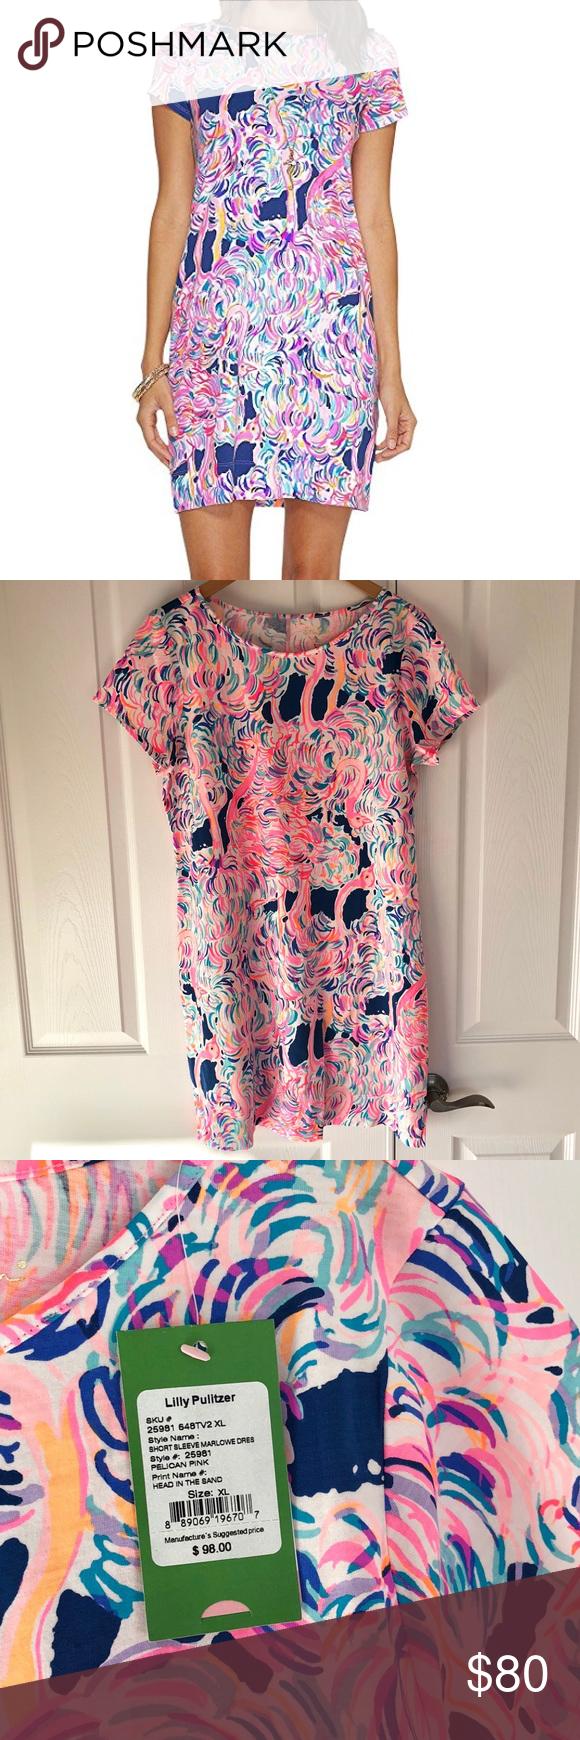 Lilly Pulitzer Short Sleeve Marlow Dress Nwt In 2018 My Posh Picks